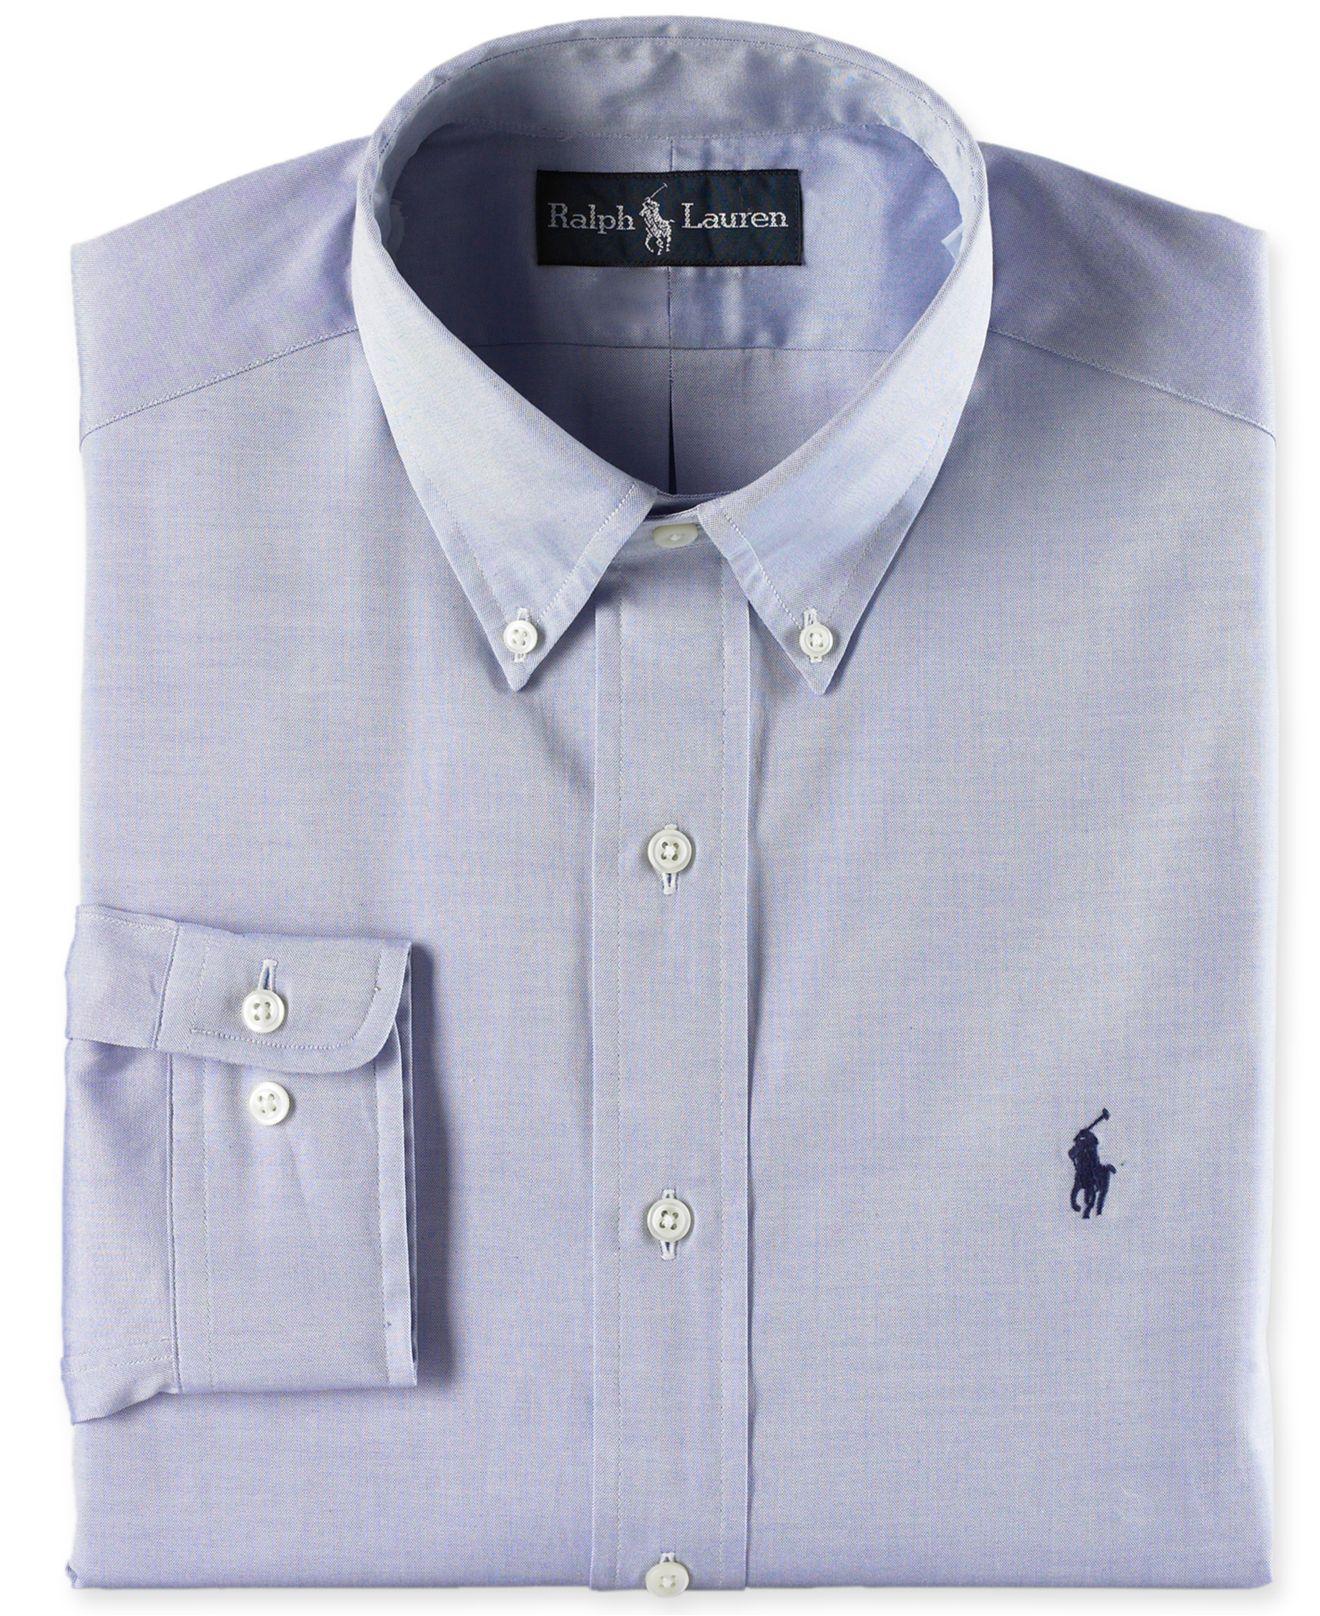 Lyst Polo Ralph Lauren Pinpoint Dress Shirt In Blue For Men